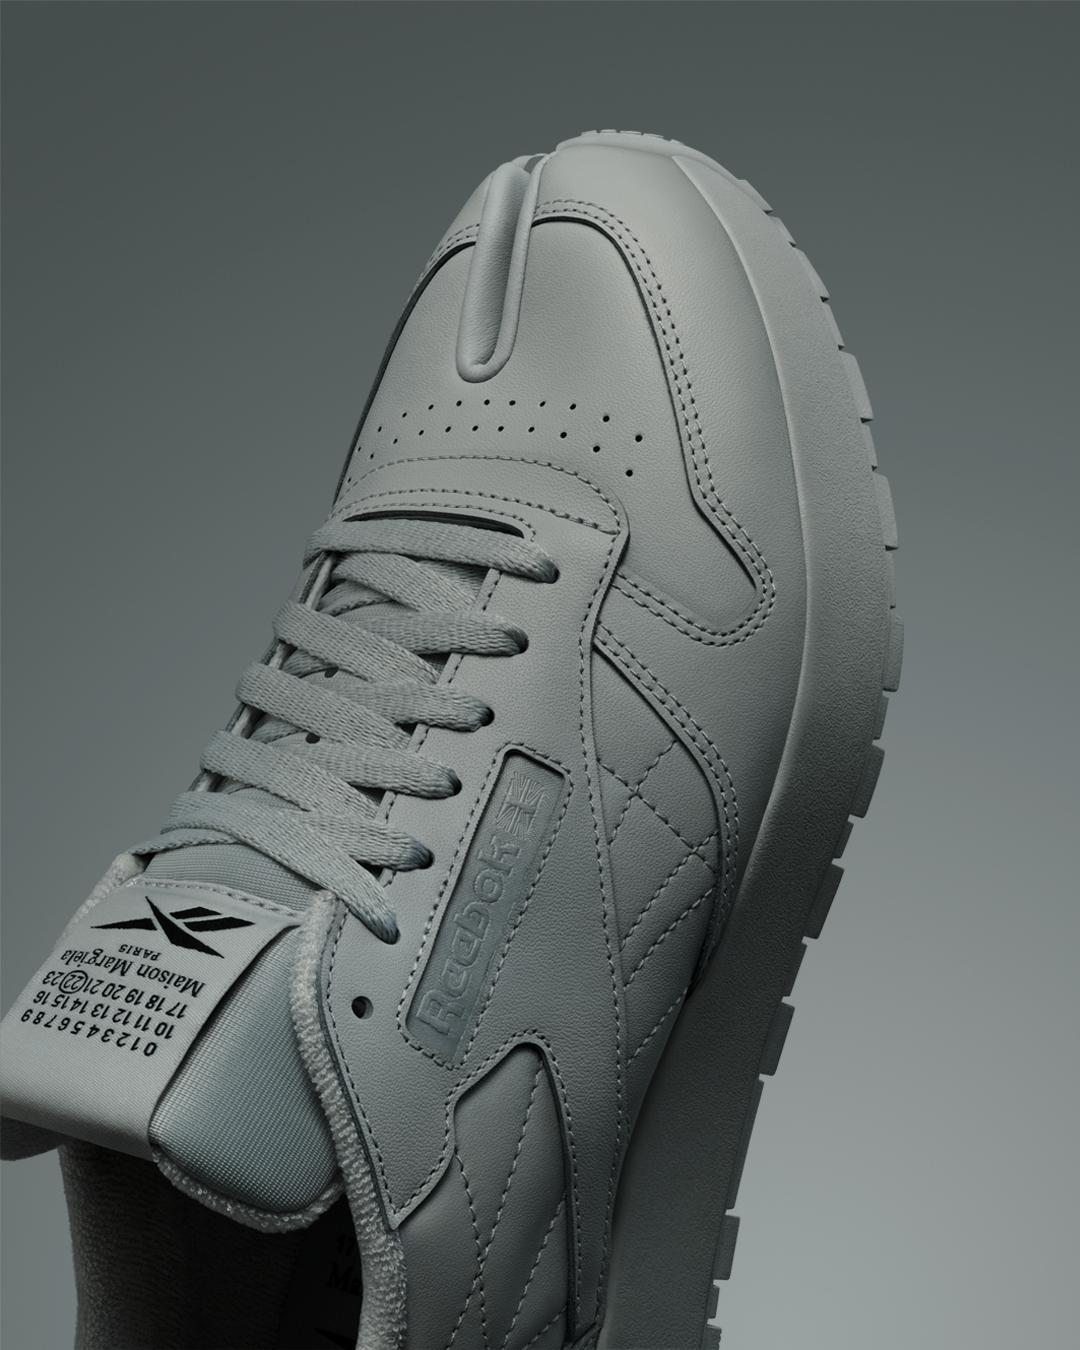 Reebok x Maison Margiela Classic Leather Tabi - Pure Grey 2 / Black / White - H05534